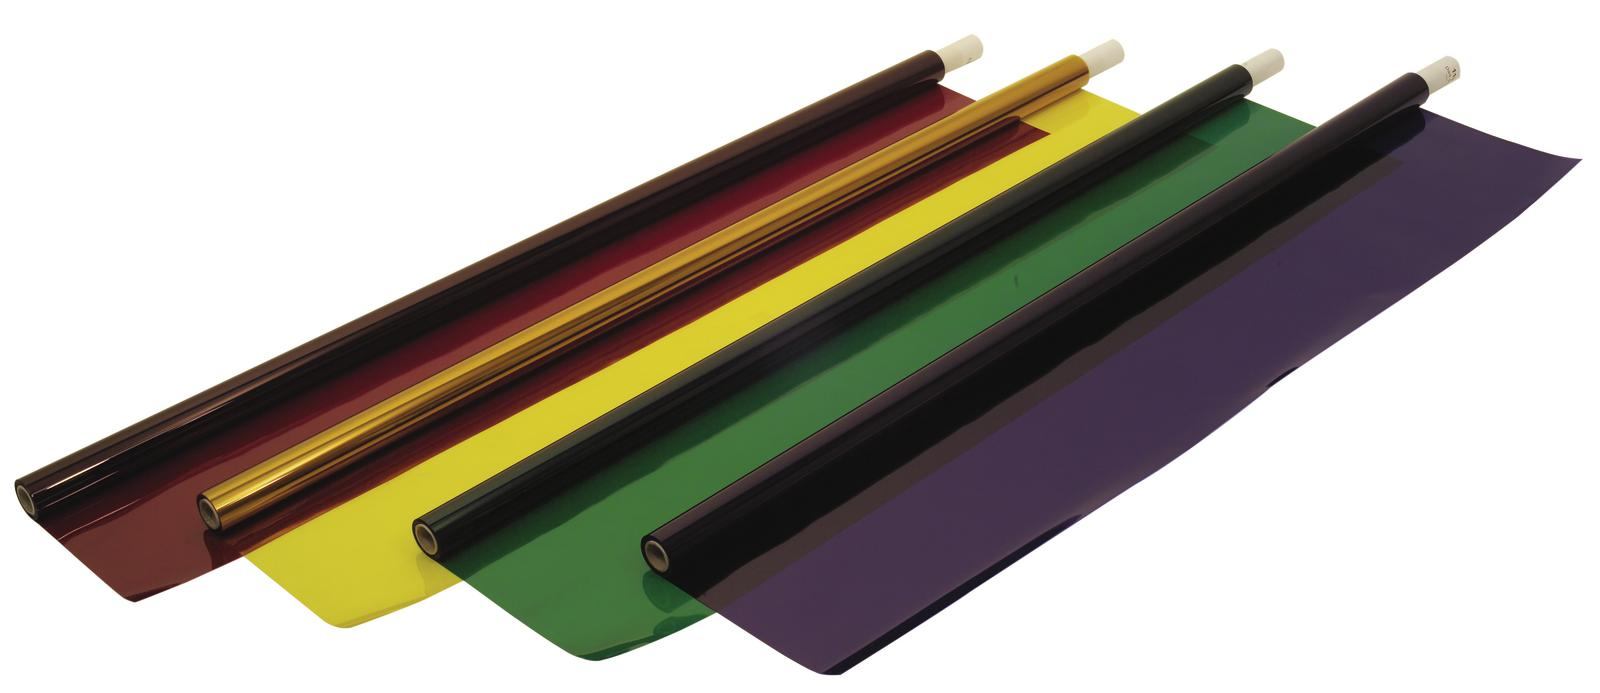 eurolite-farbfolienrolle-280-61cmx762cm